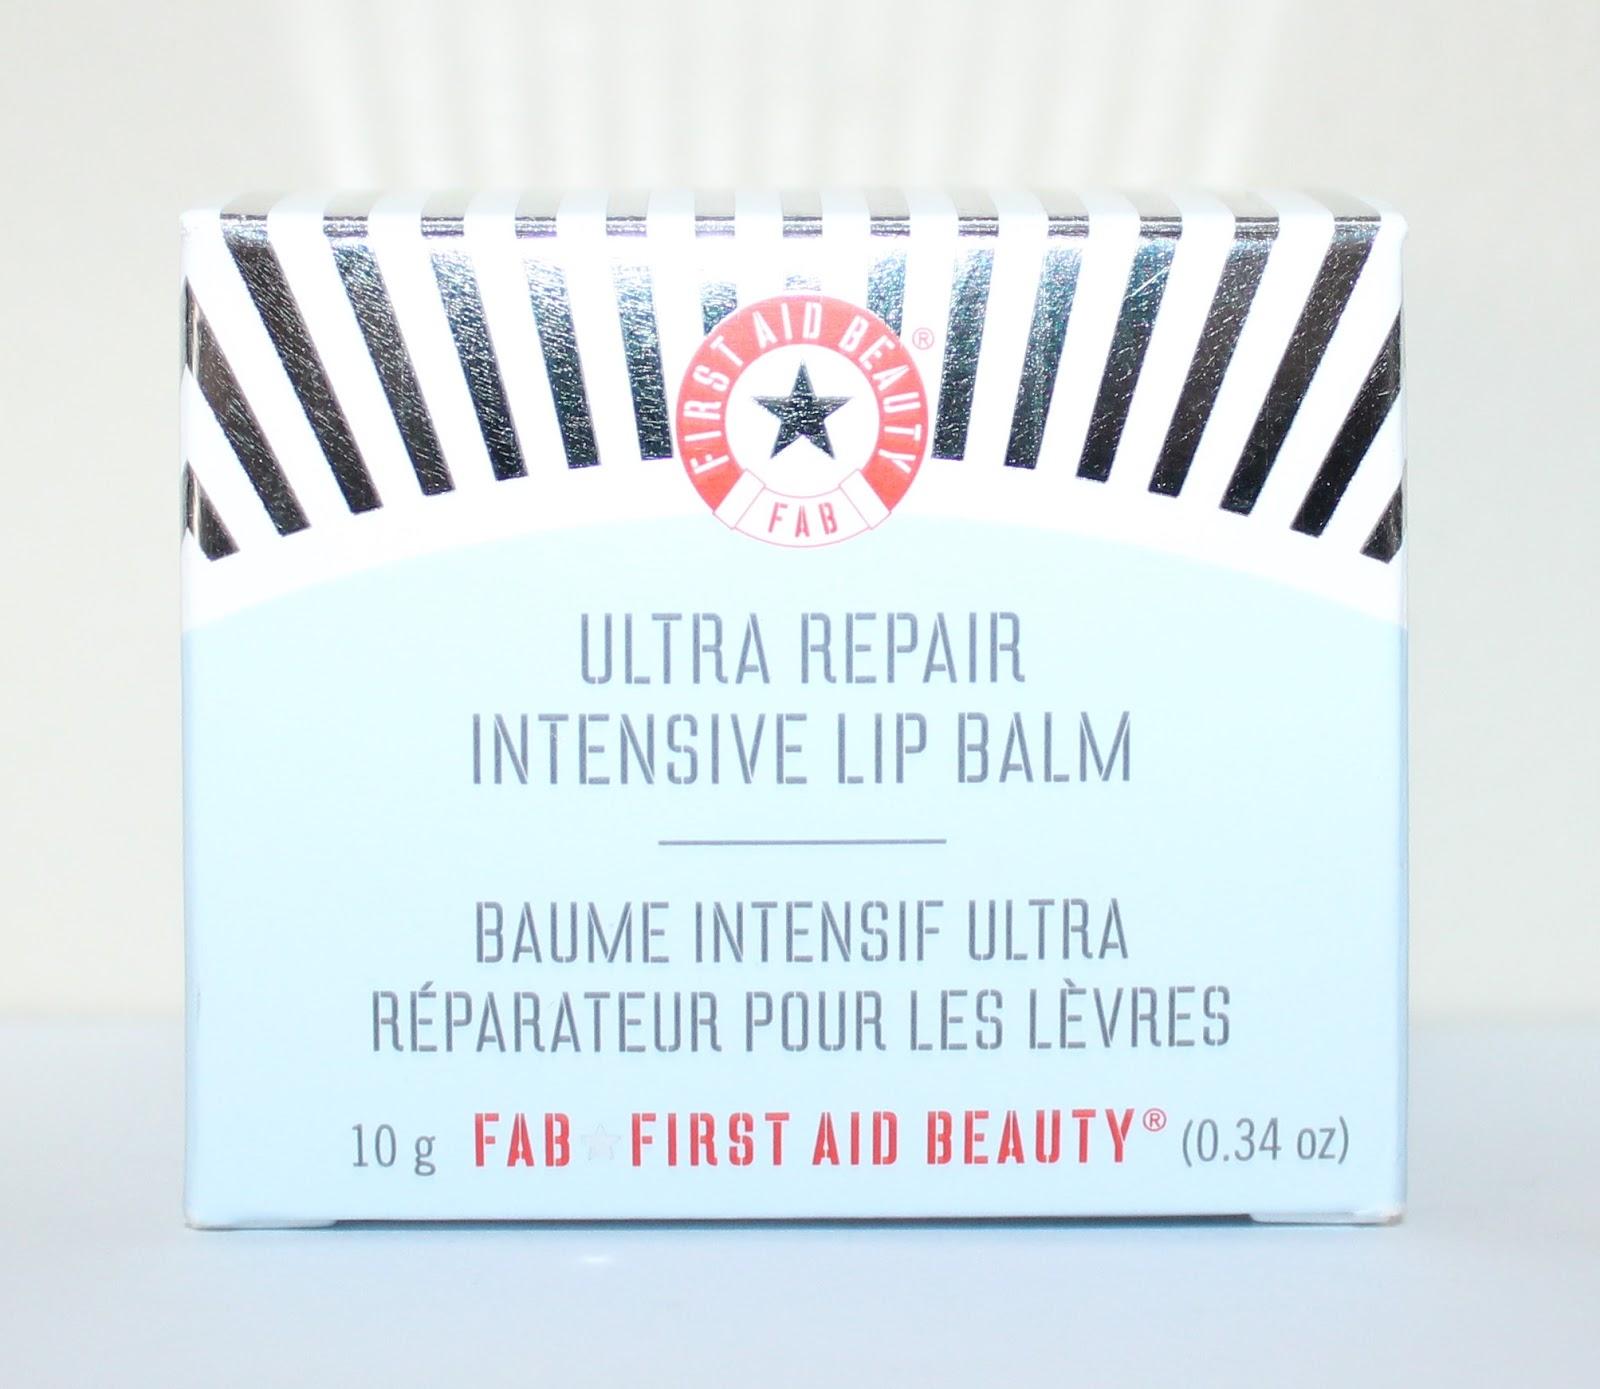 Ultra Repair Intensive Lip Balm by First Aid Beauty #11